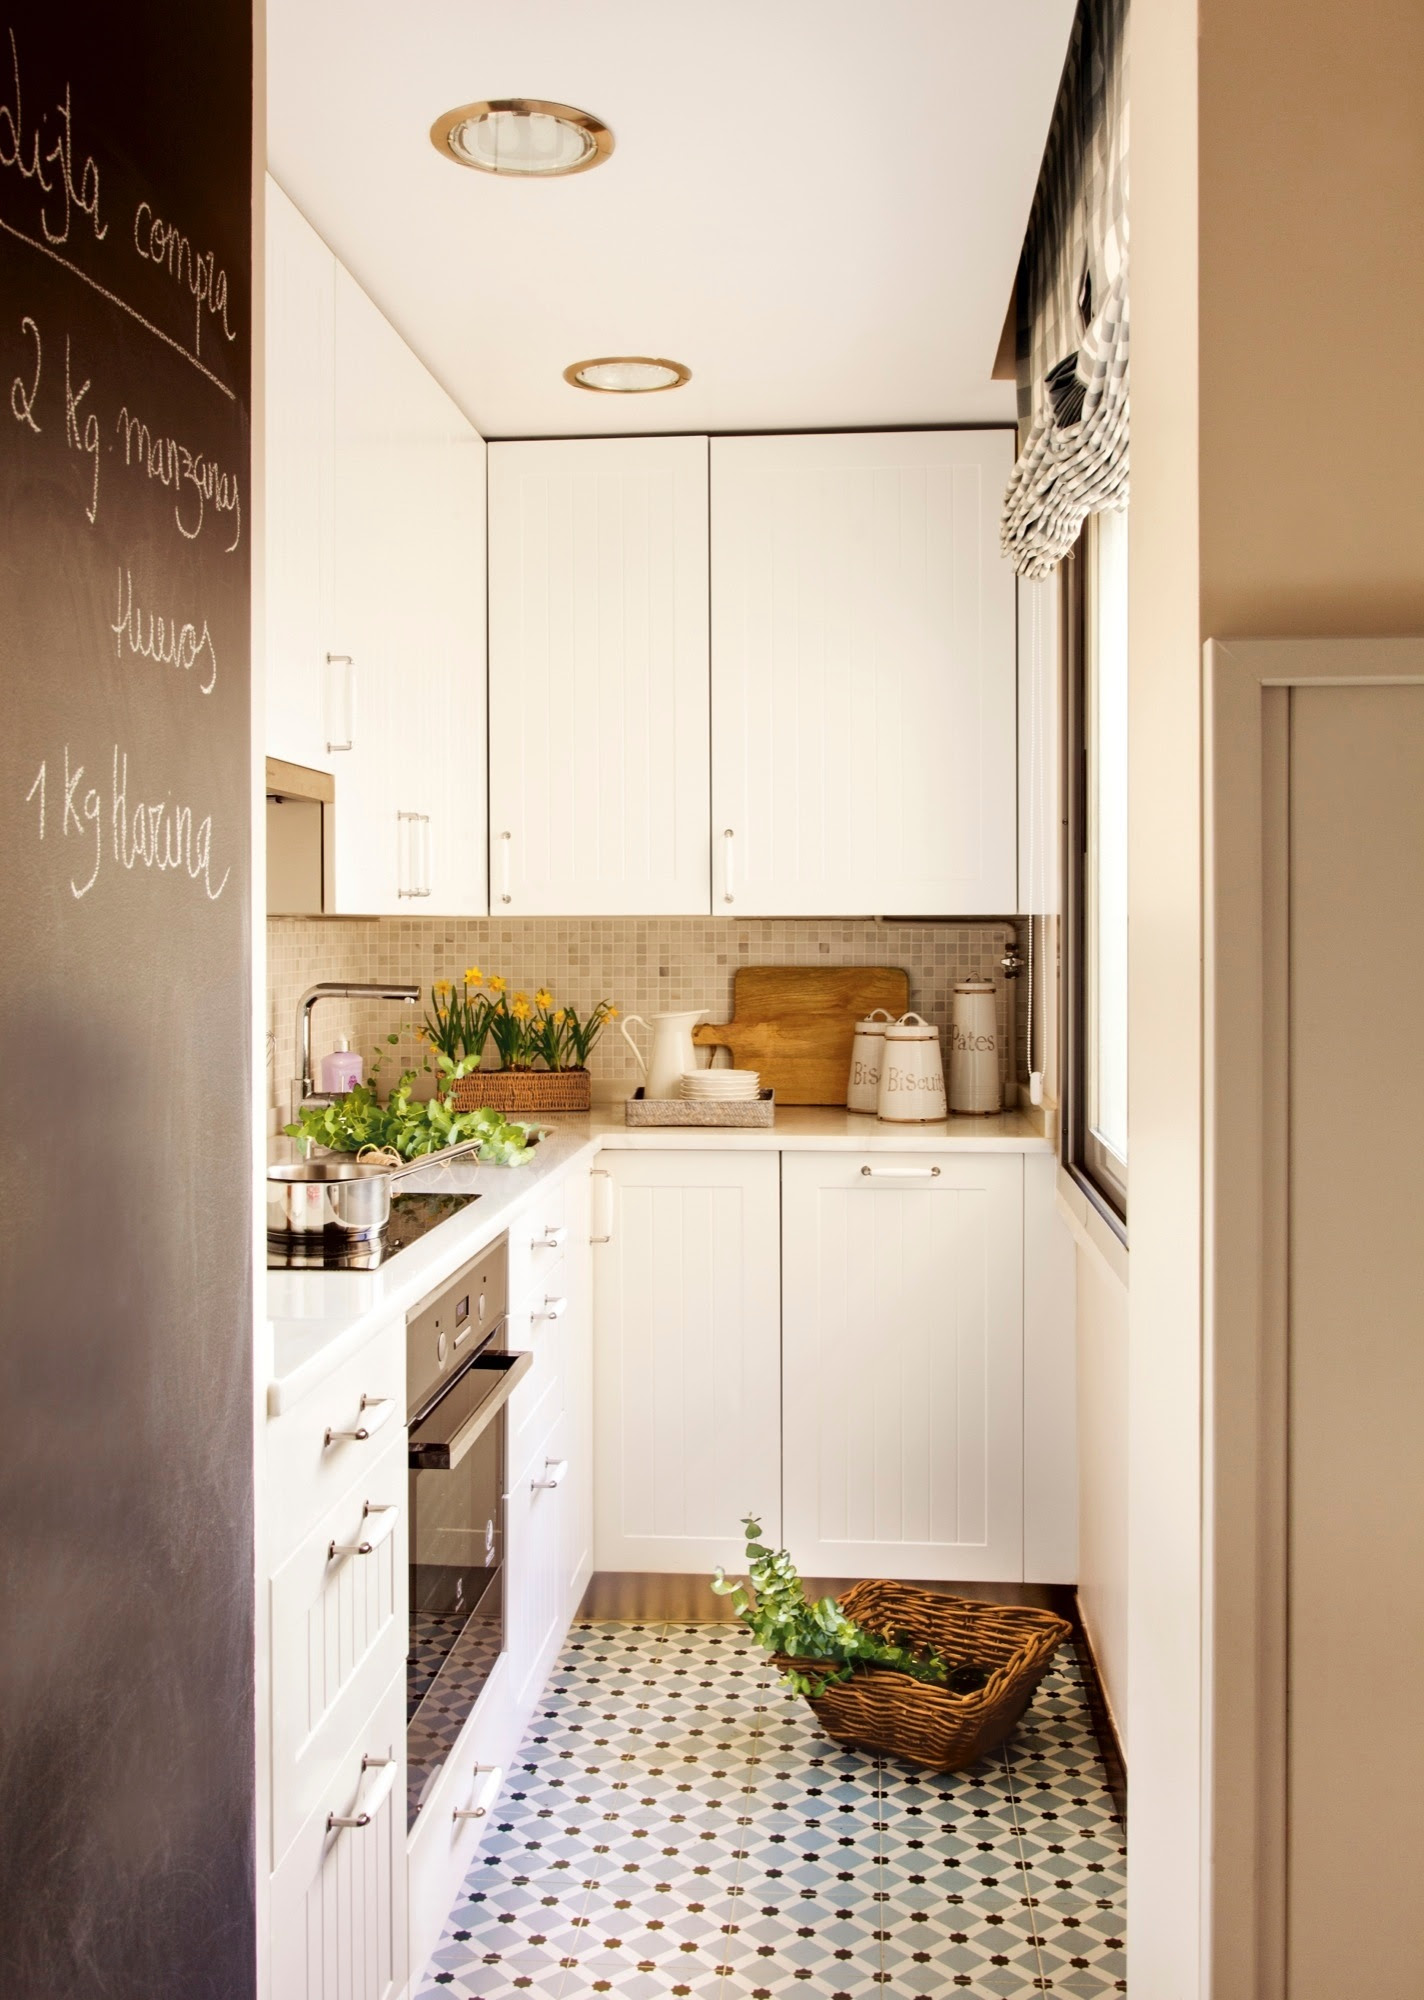 00400776. Cocina mini con mobiliario en blanco